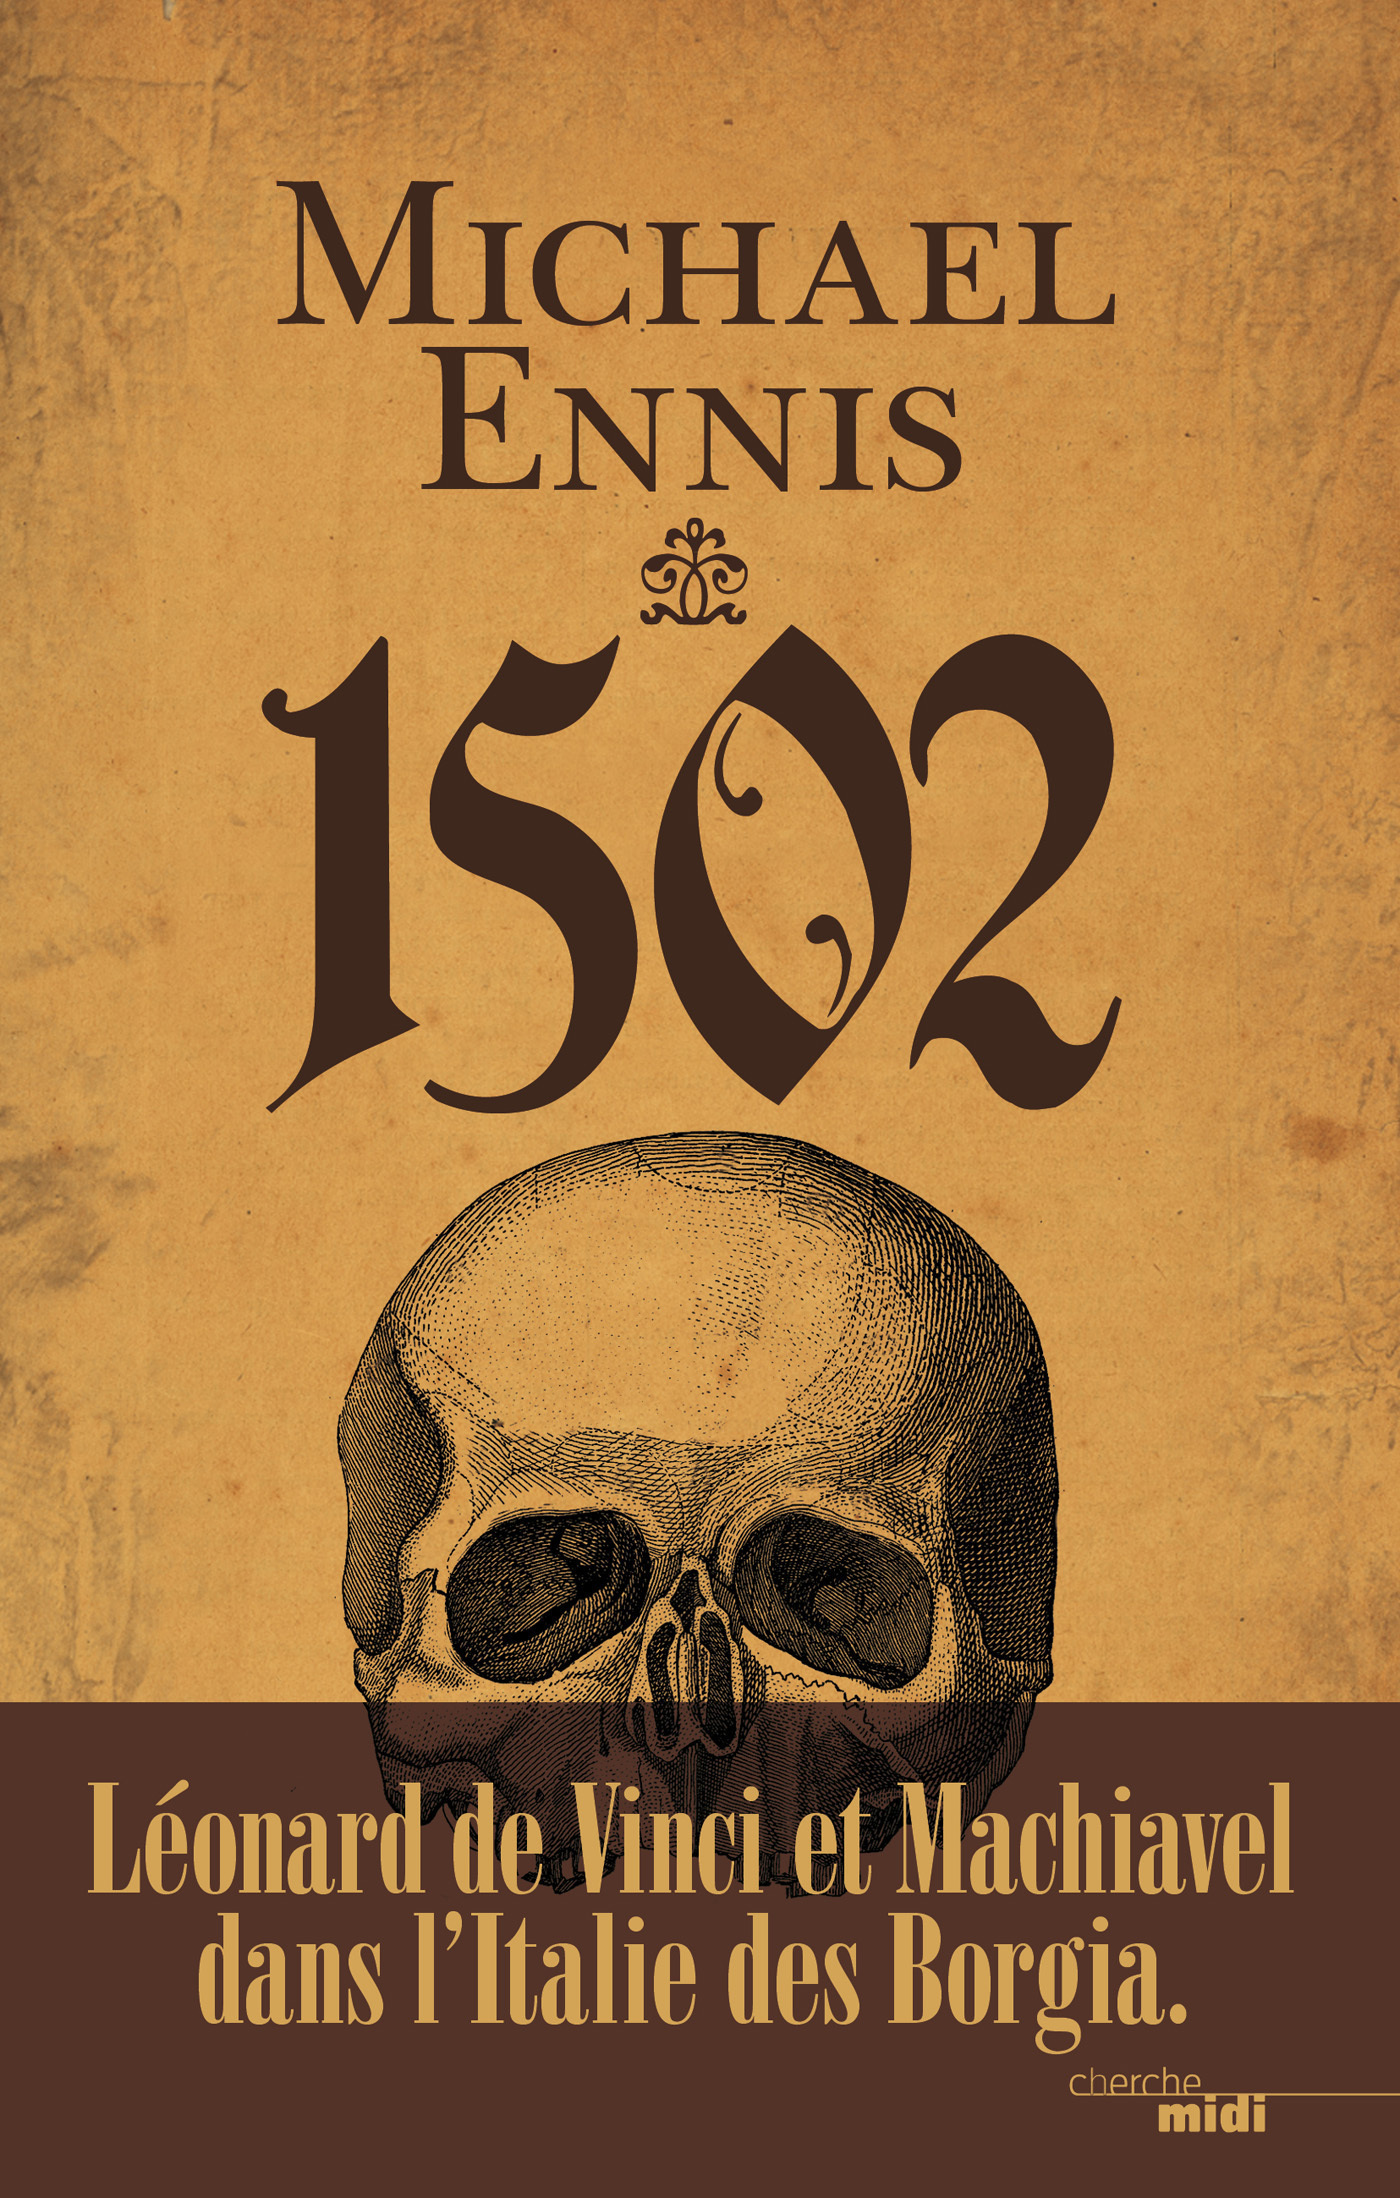 1502 (ebook)